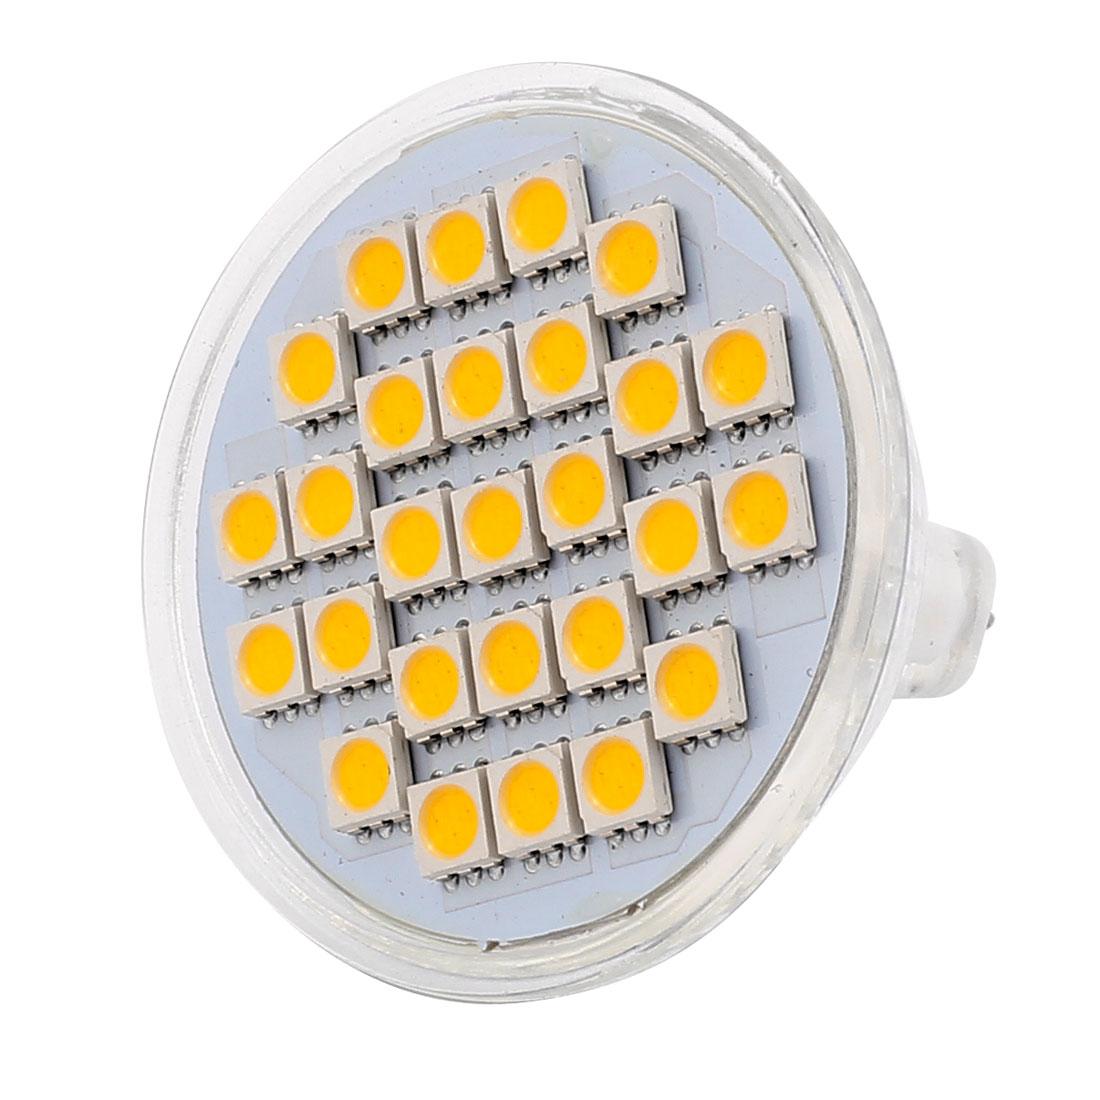 MR16 SMD5050 27LEDs AC 110V 4W Glass Energy Saving LED Lamp Bulb Warm White